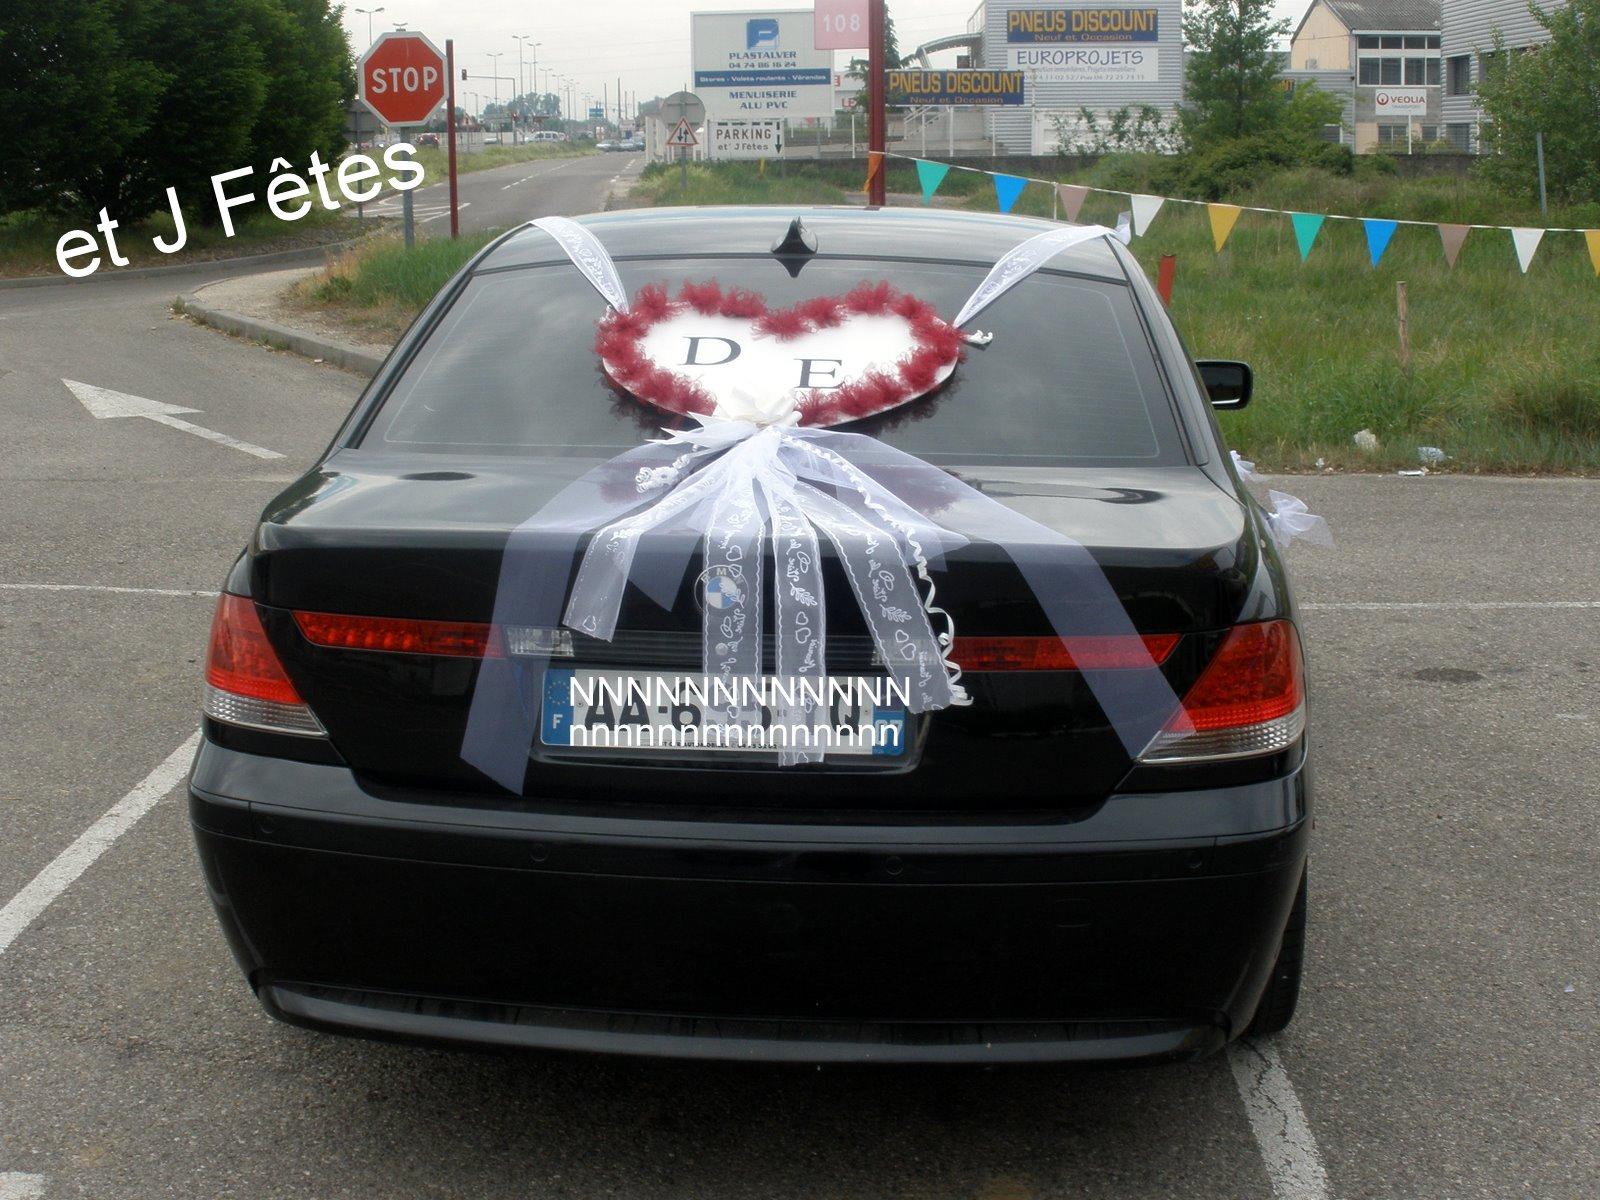 D coration voiture mariage - Decoration vehicule mariage ...